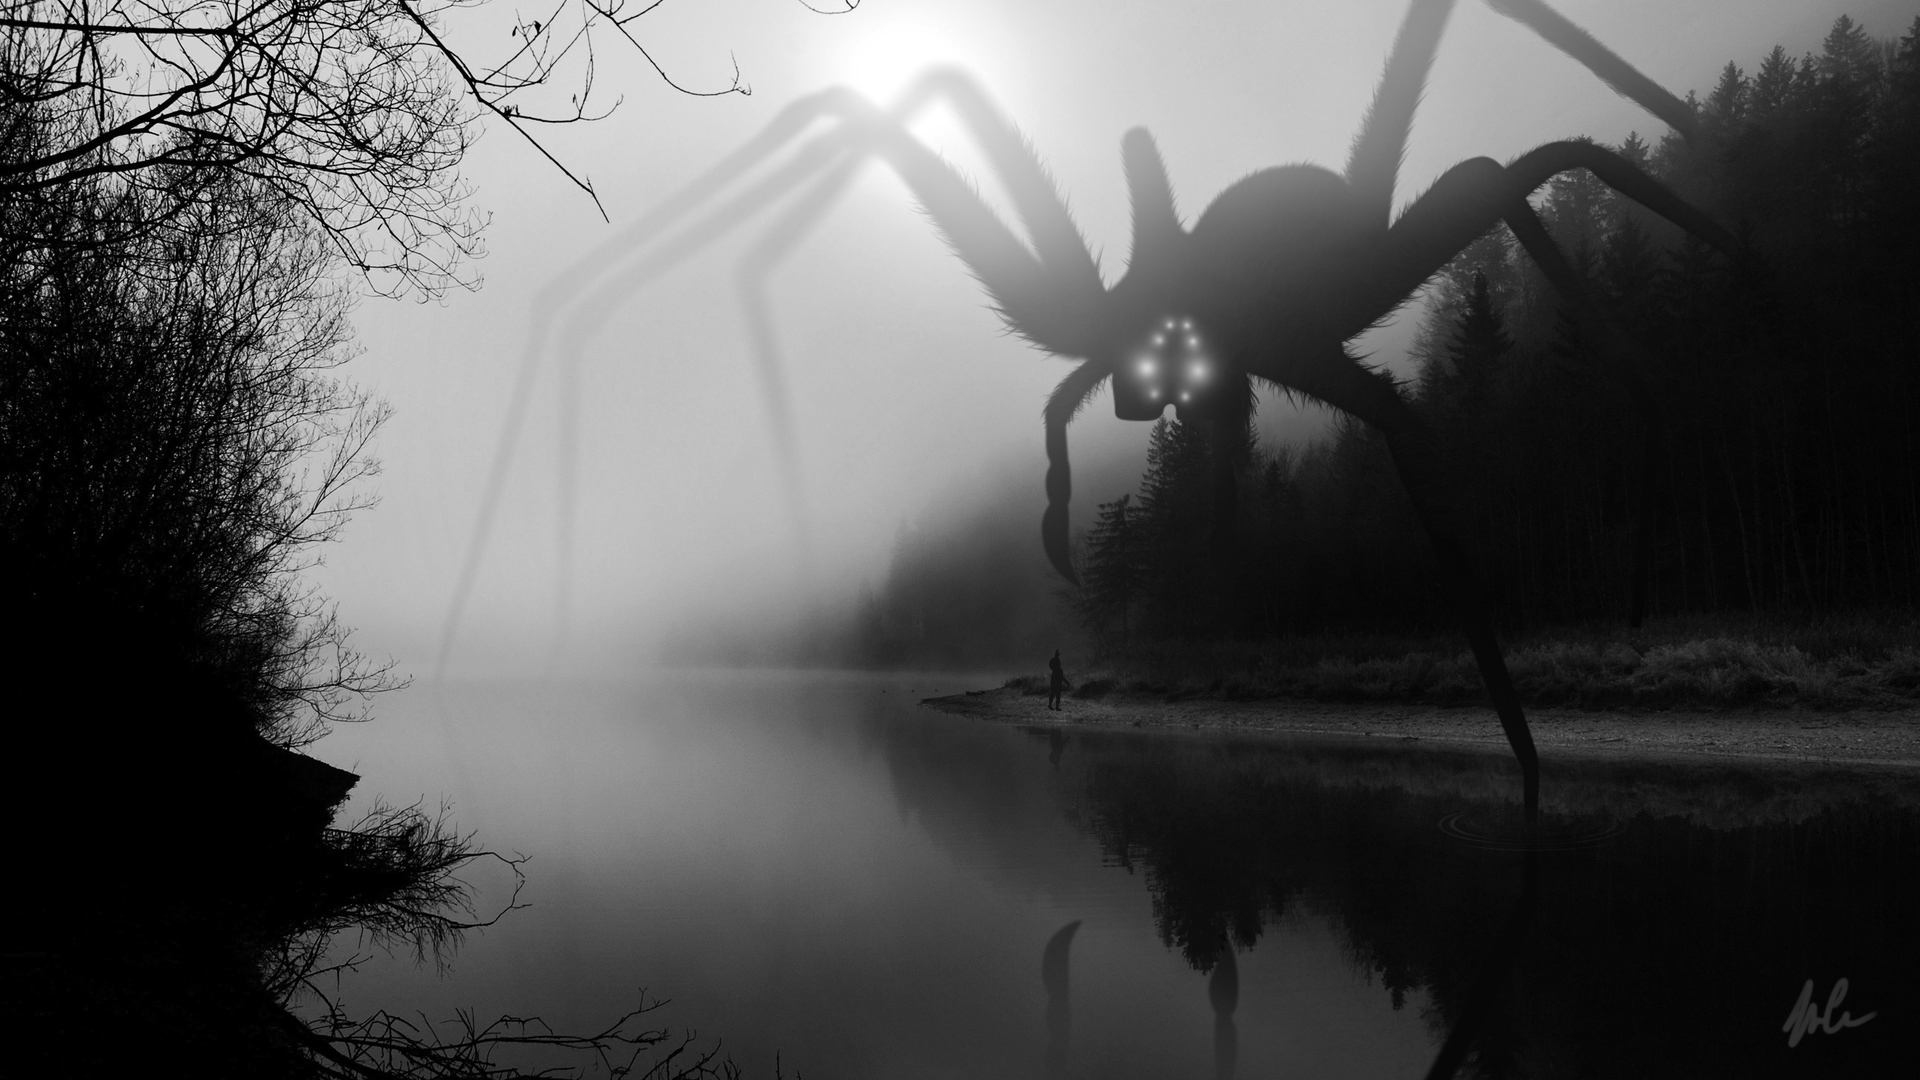 SpiderMist_Hires.jpg